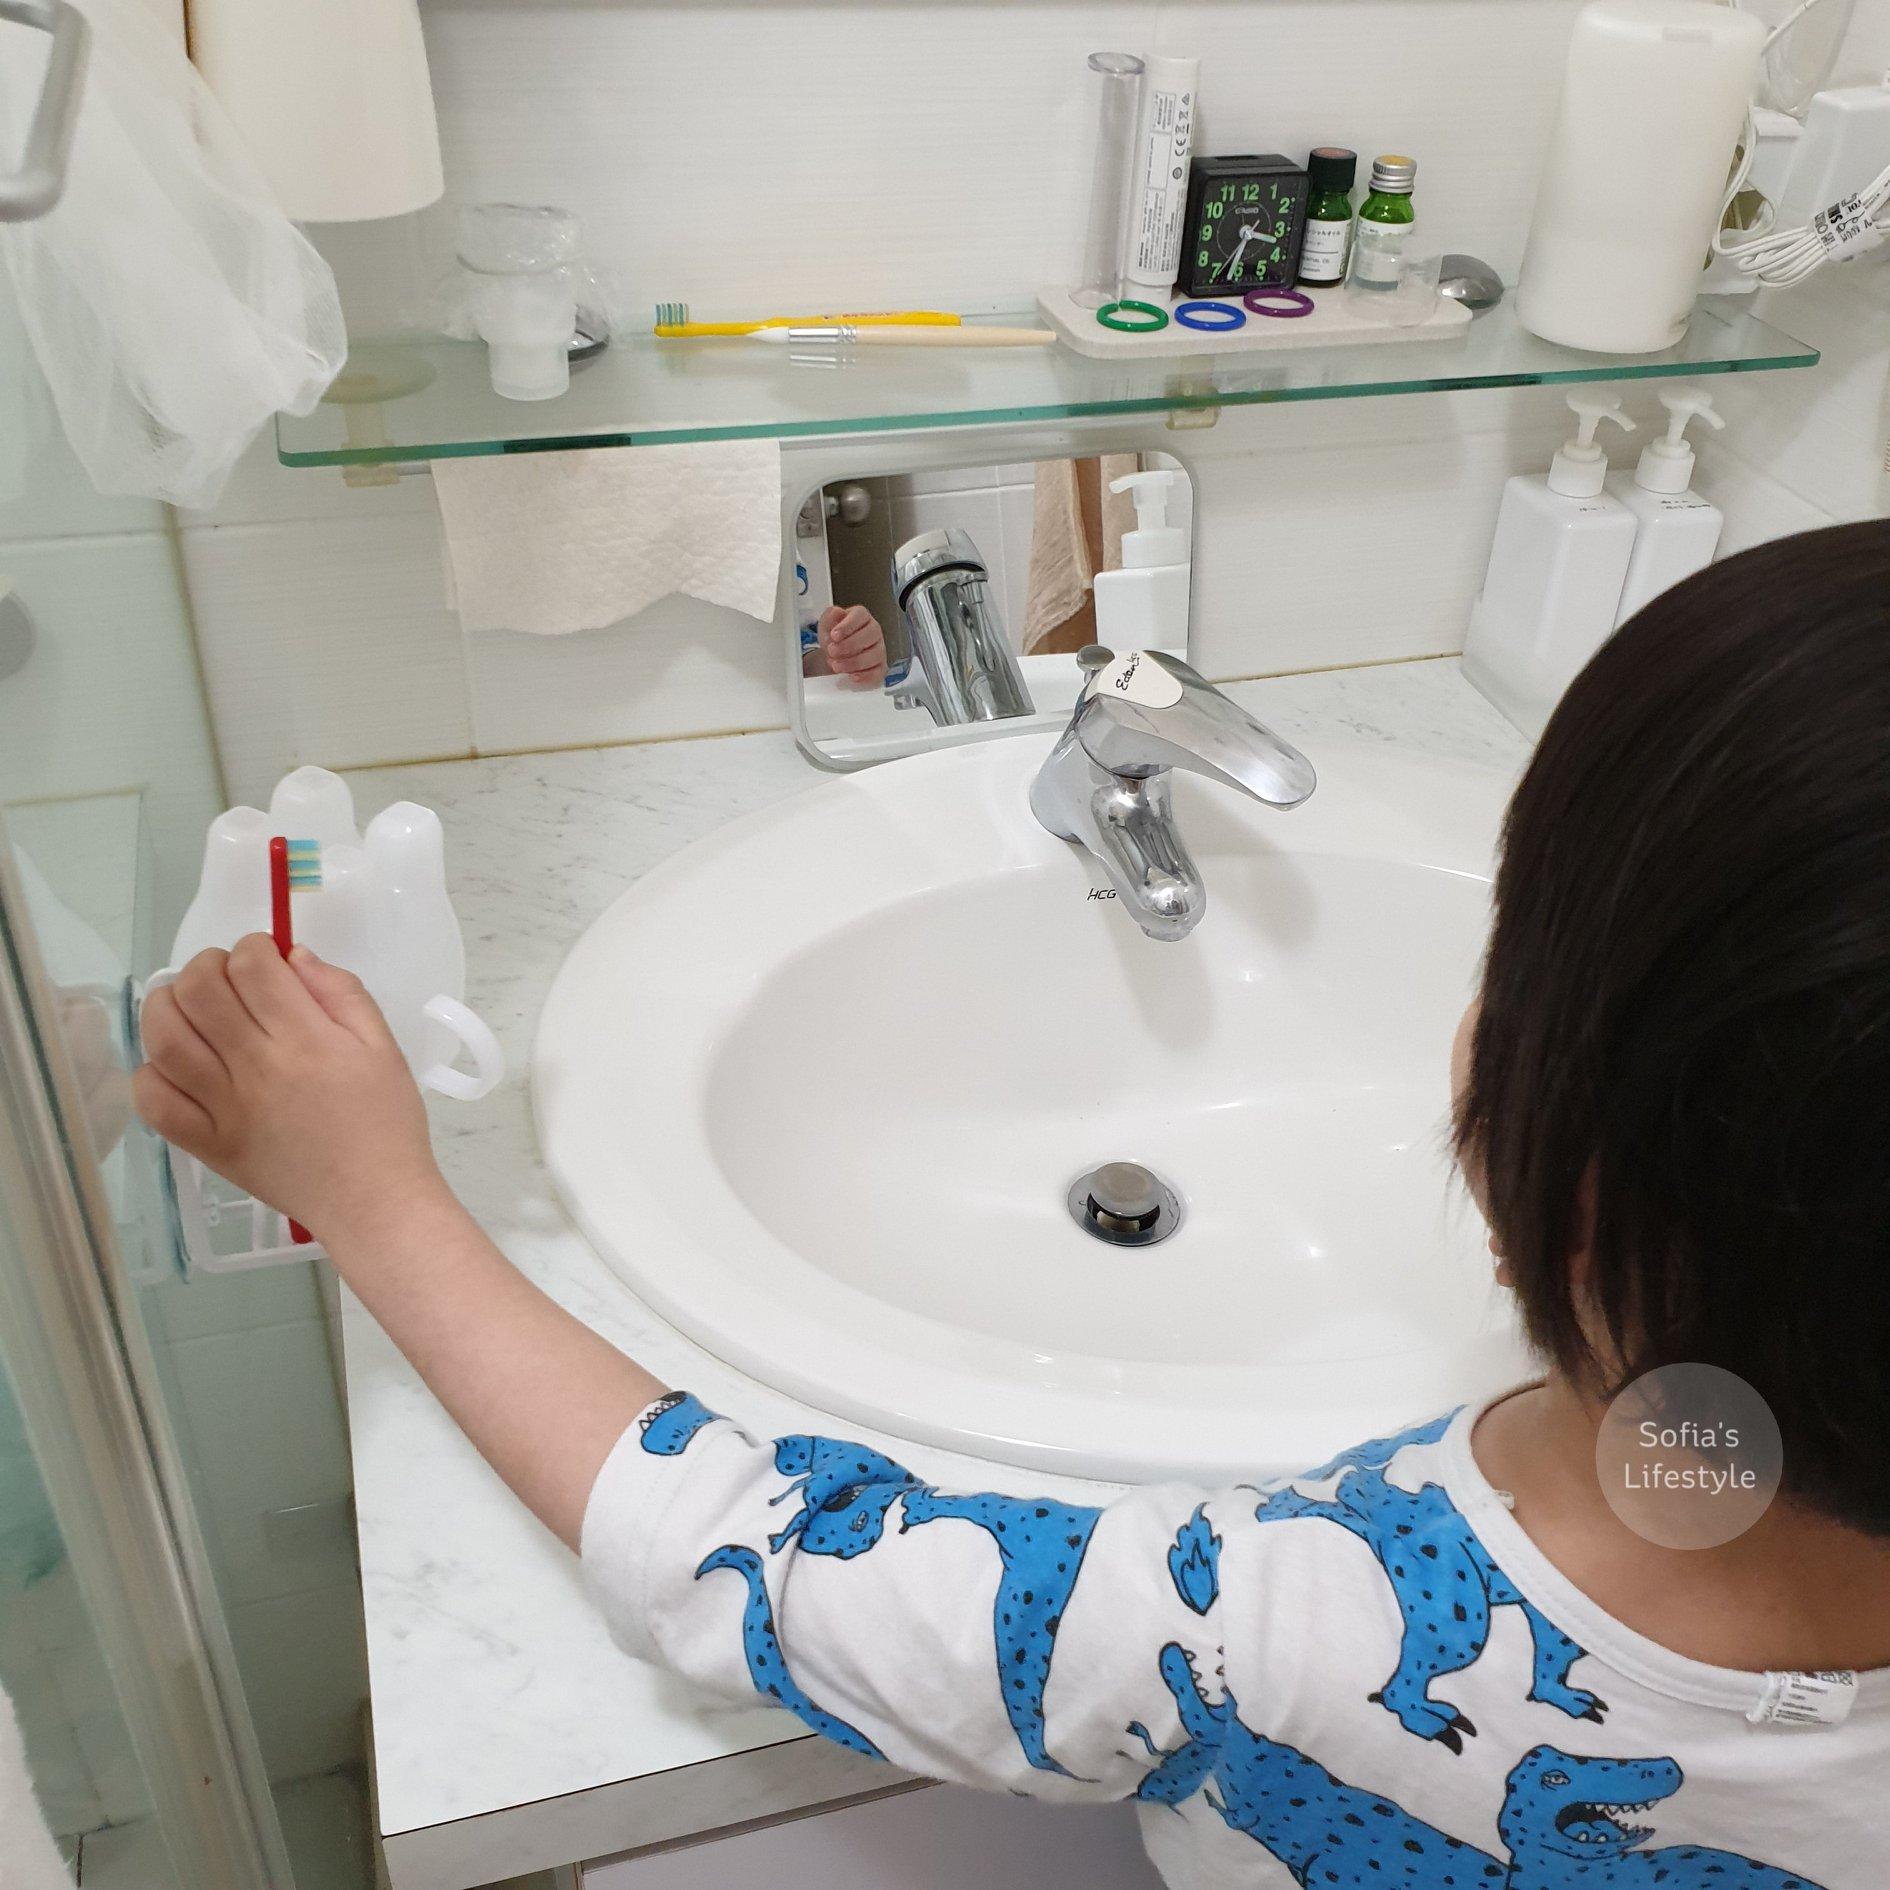 Yamazaki 山崎收納 MIST吸盤式牙刷兩用杯架